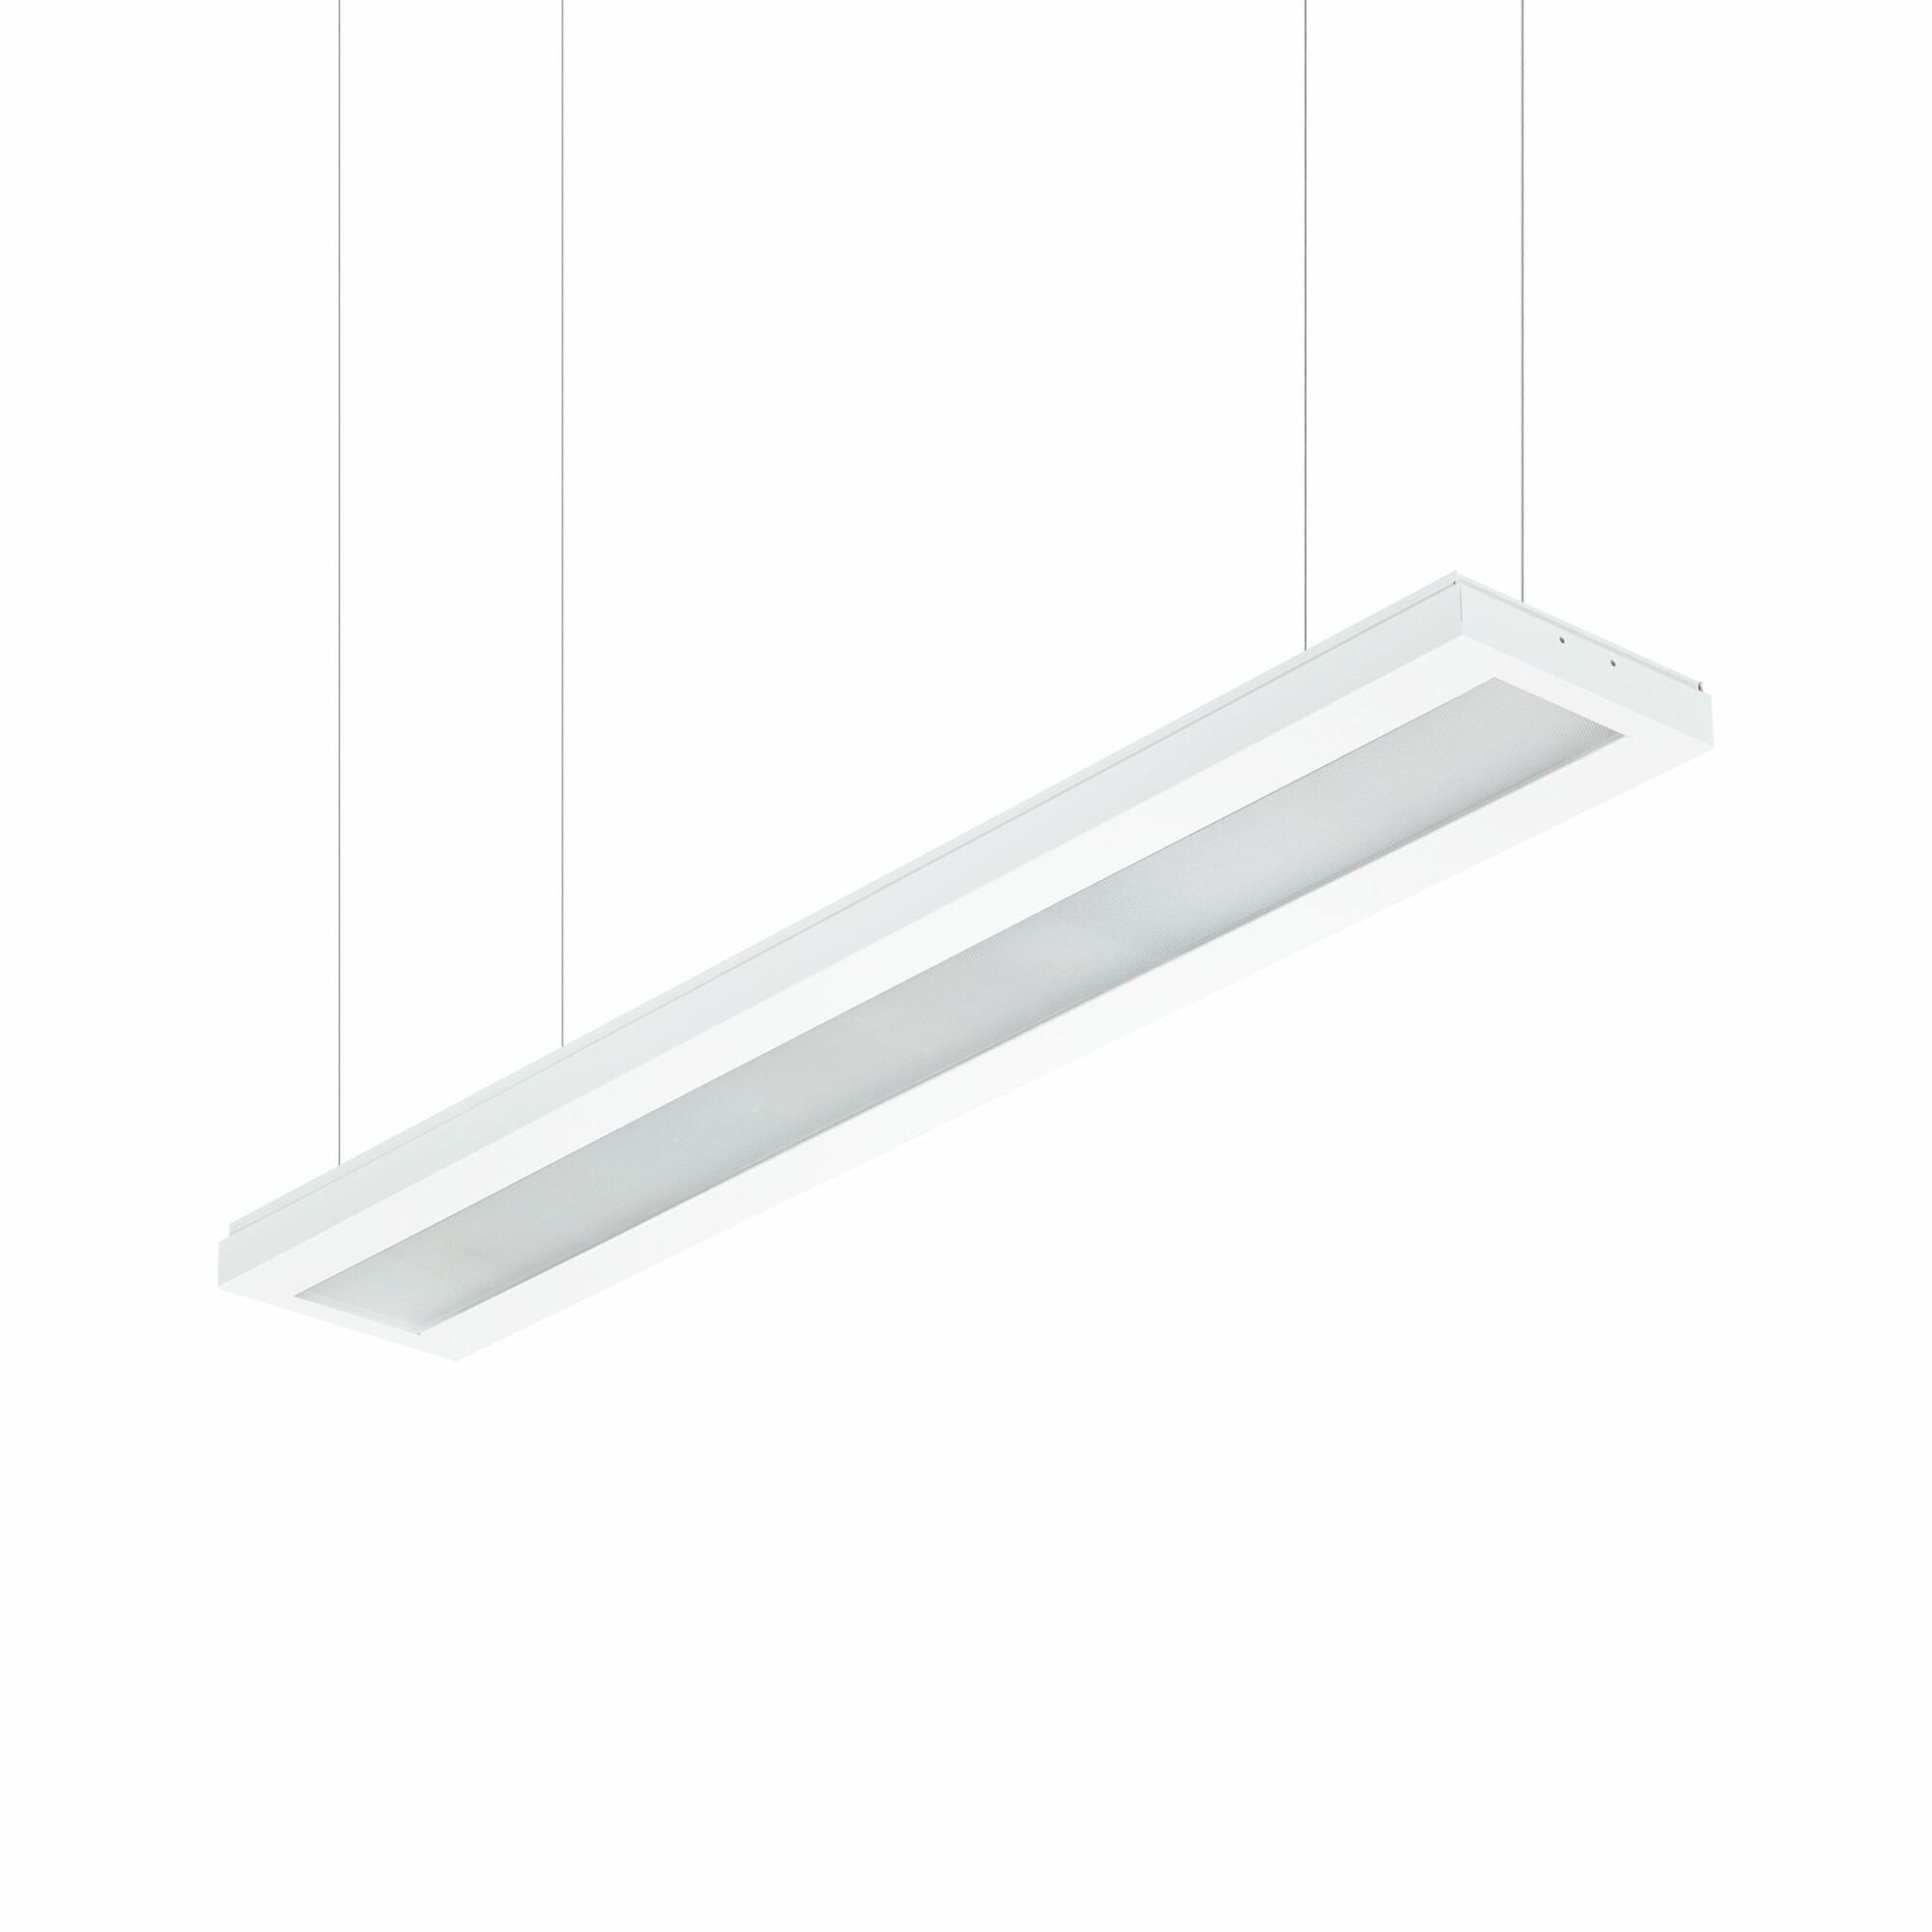 Philips CORELINE Systeem & profiel LED 1x34W/3700lm Wit